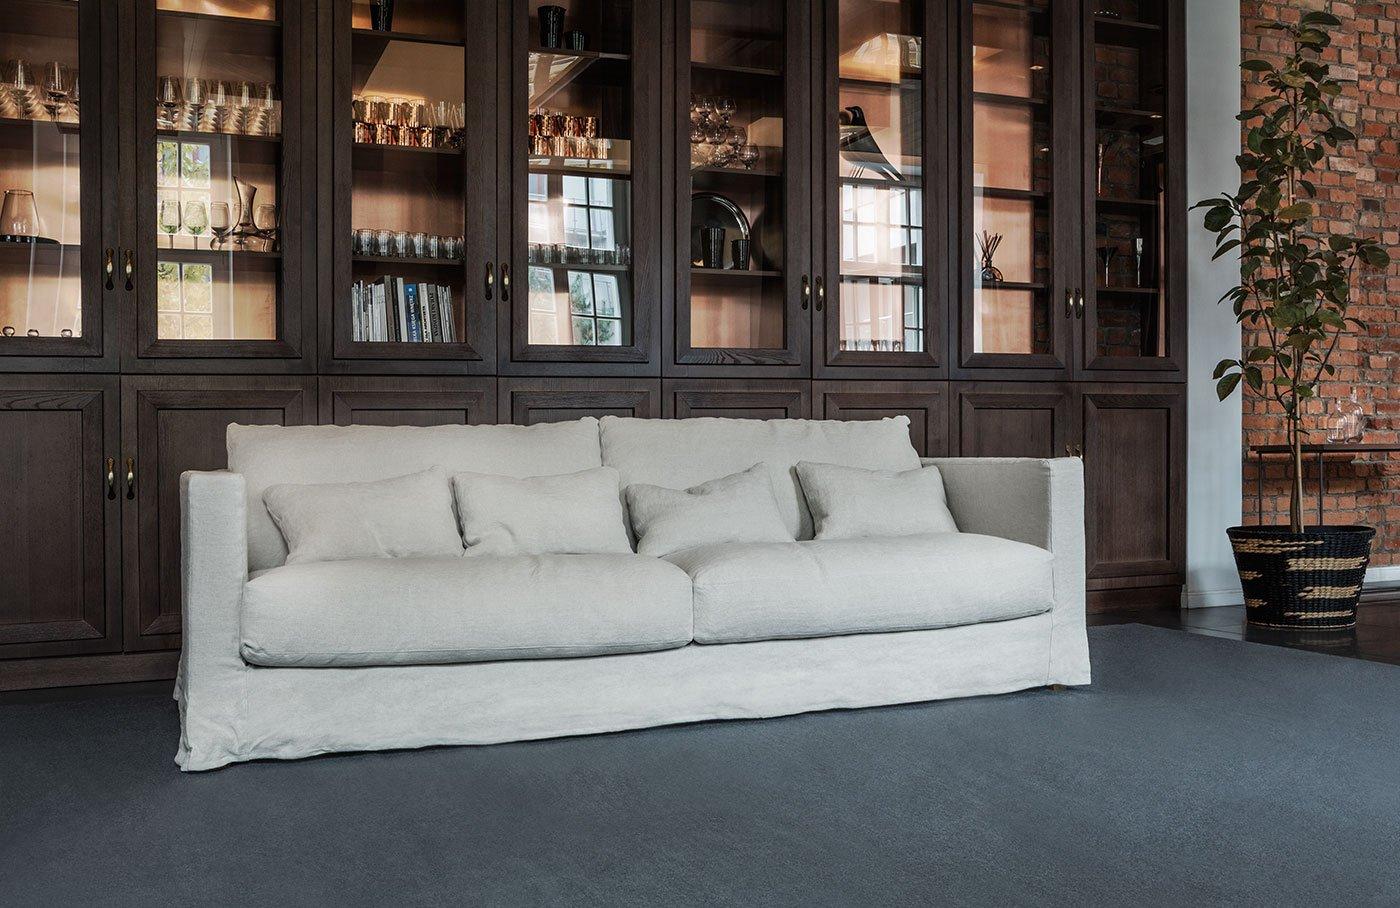 Full Size of Big Sofas Gigantisch Bequem Bei Livingformede Livingforme Sofa Antik Mit Relaxfunktion 3 Sitzer Kolonialstil Xxl Grau Gebrauchte Fenster Kaufen Verkaufen Sofa Big Sofa Kaufen